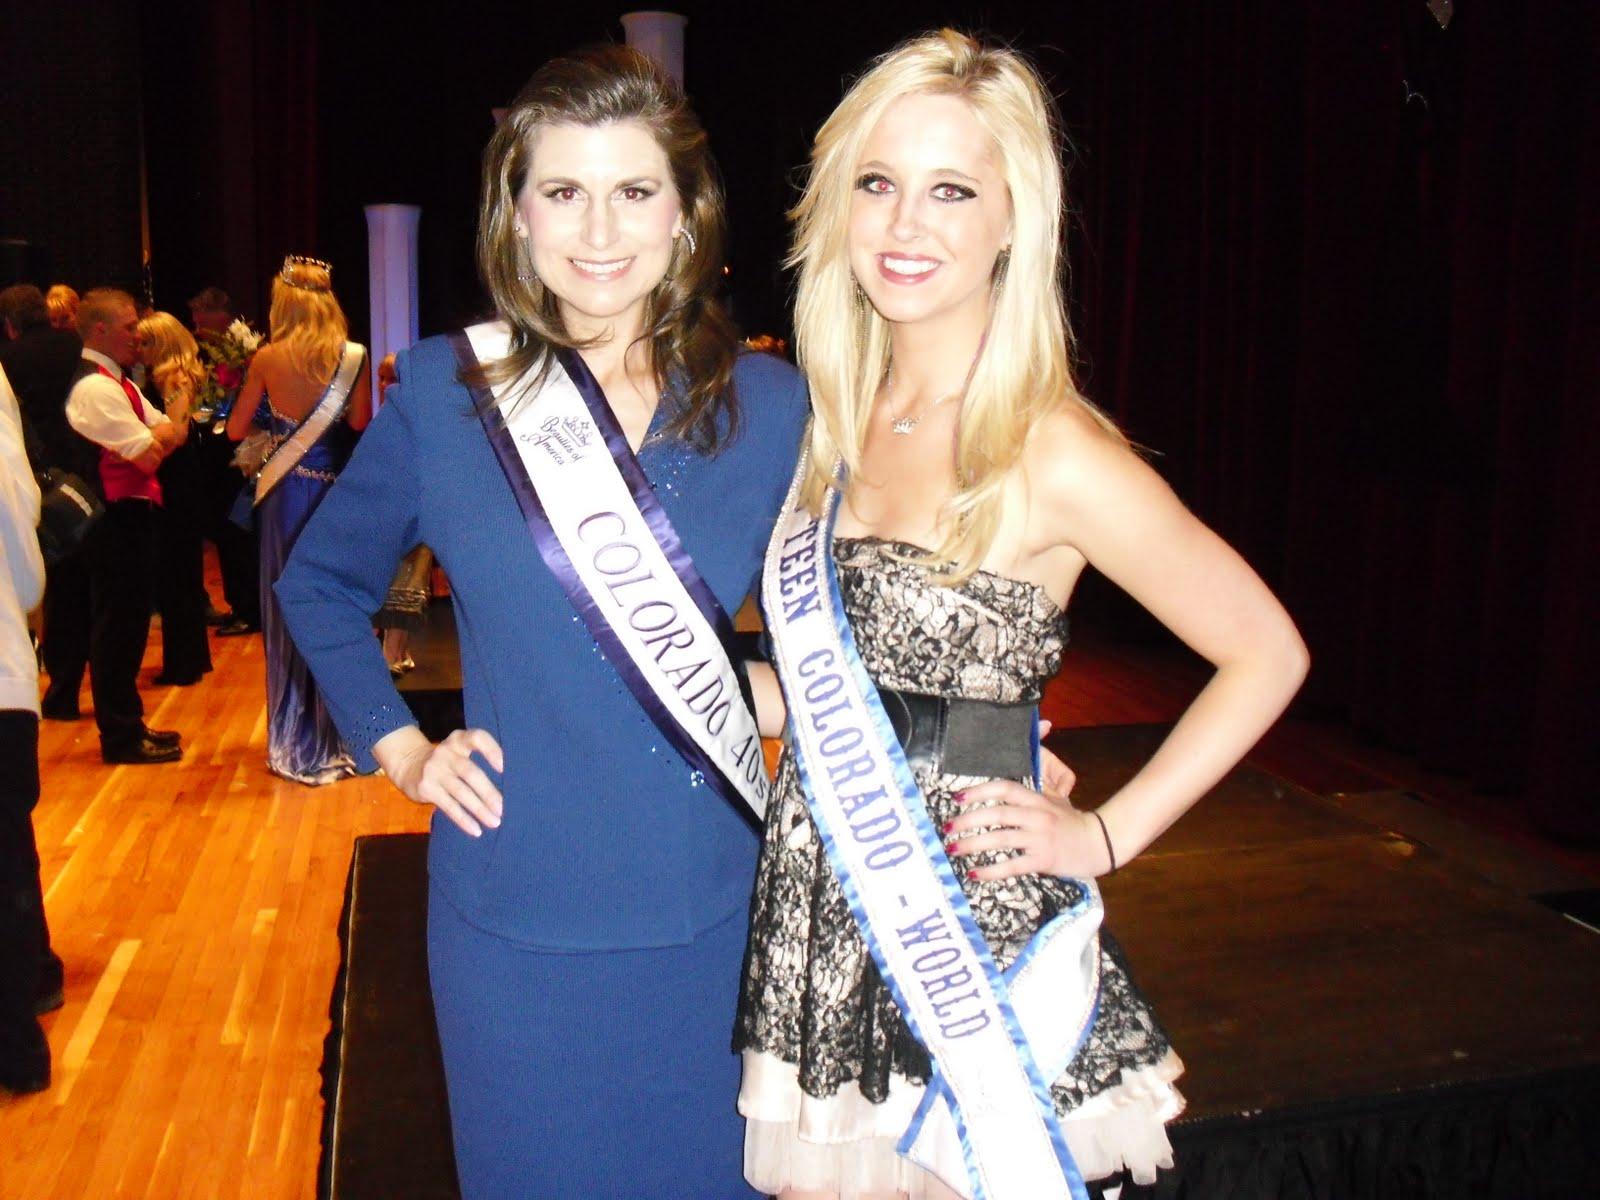 Miss Colorado USA - Wikipedia